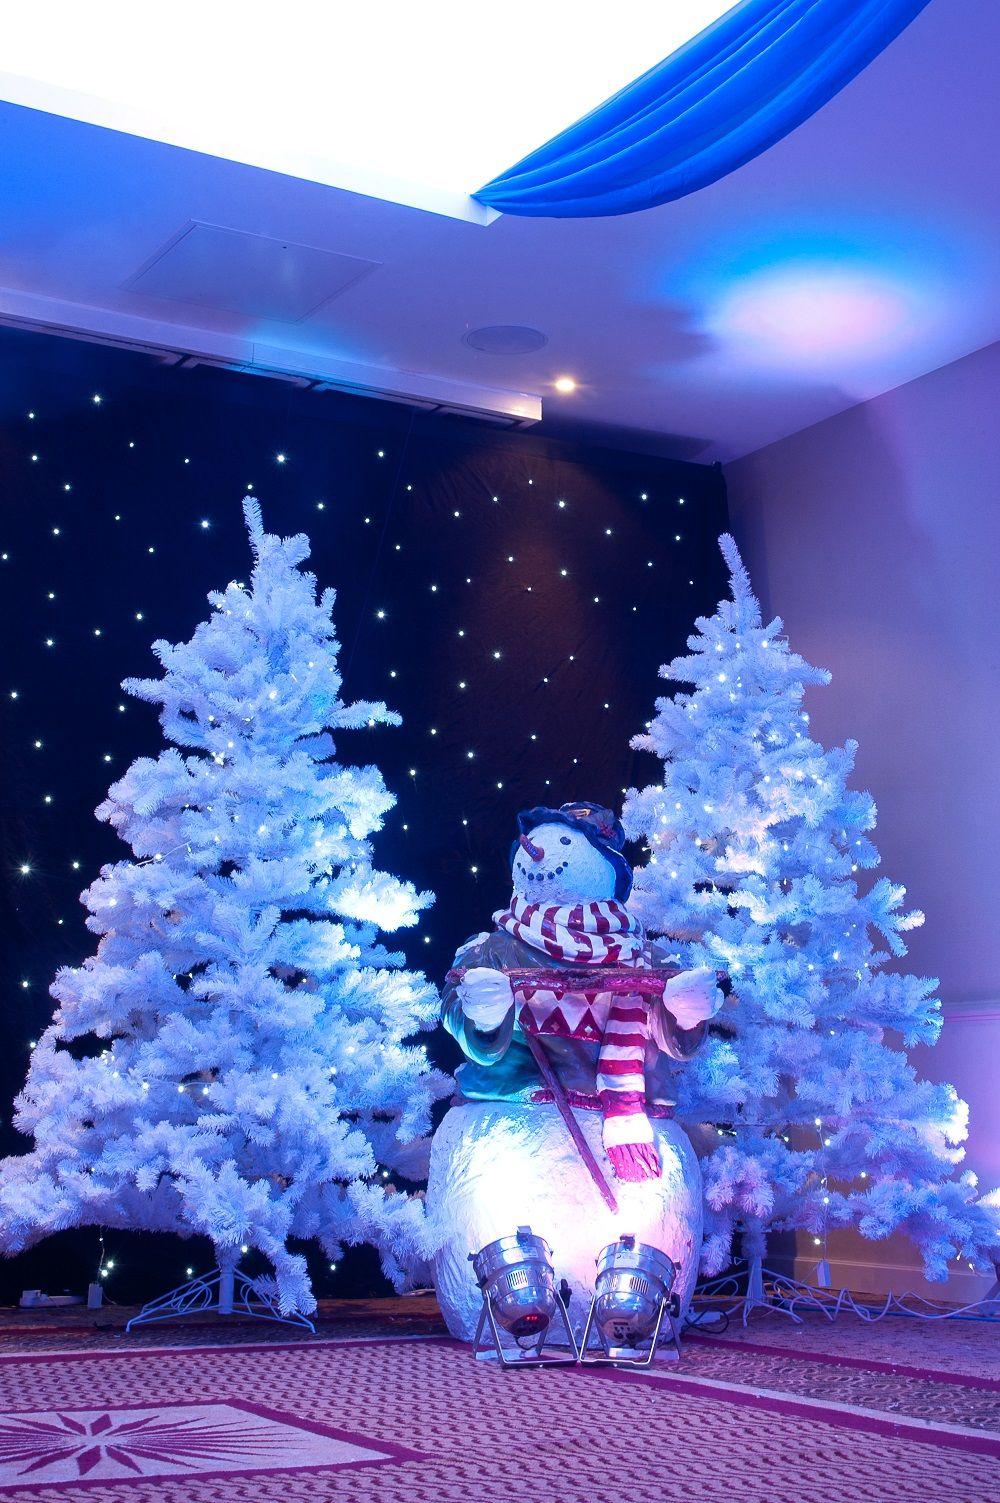 Winter Wonderland Christmas Theme.Pin On Winter Wonderland Theme Christmas Party At The